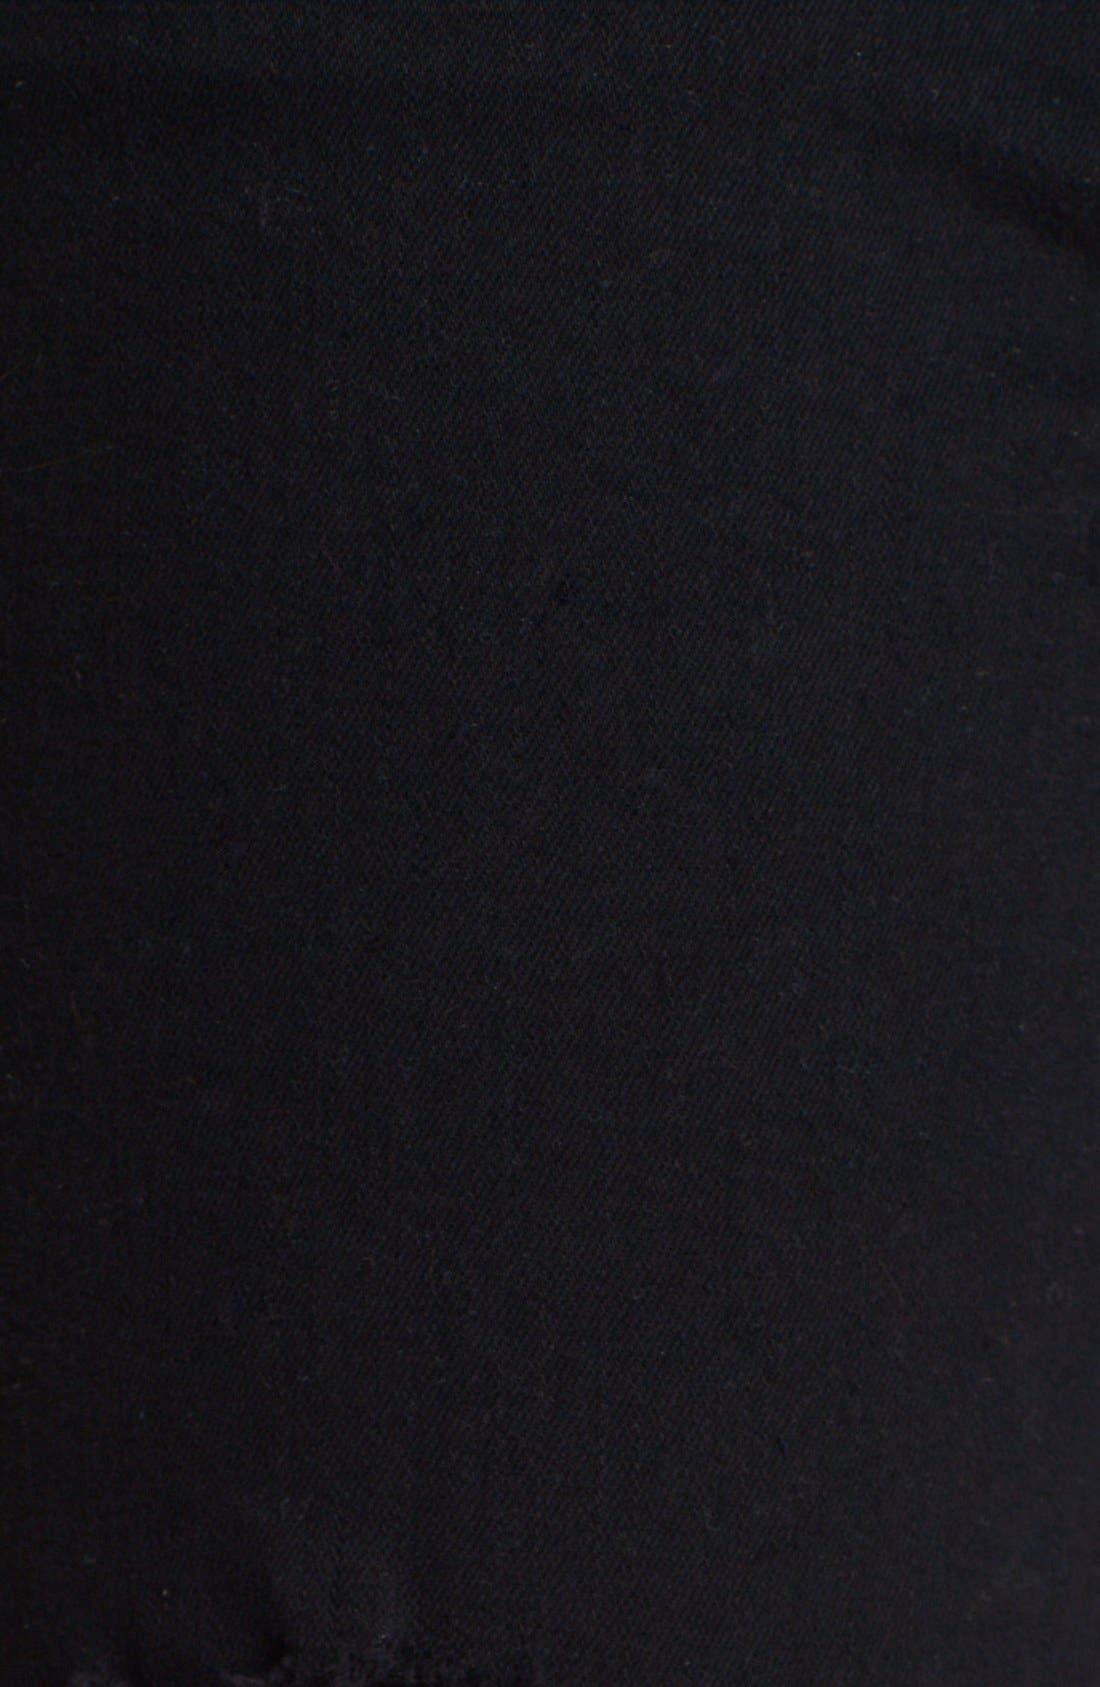 'Le Skinny de Jeanne' Ripped Jeans,                             Alternate thumbnail 3, color,